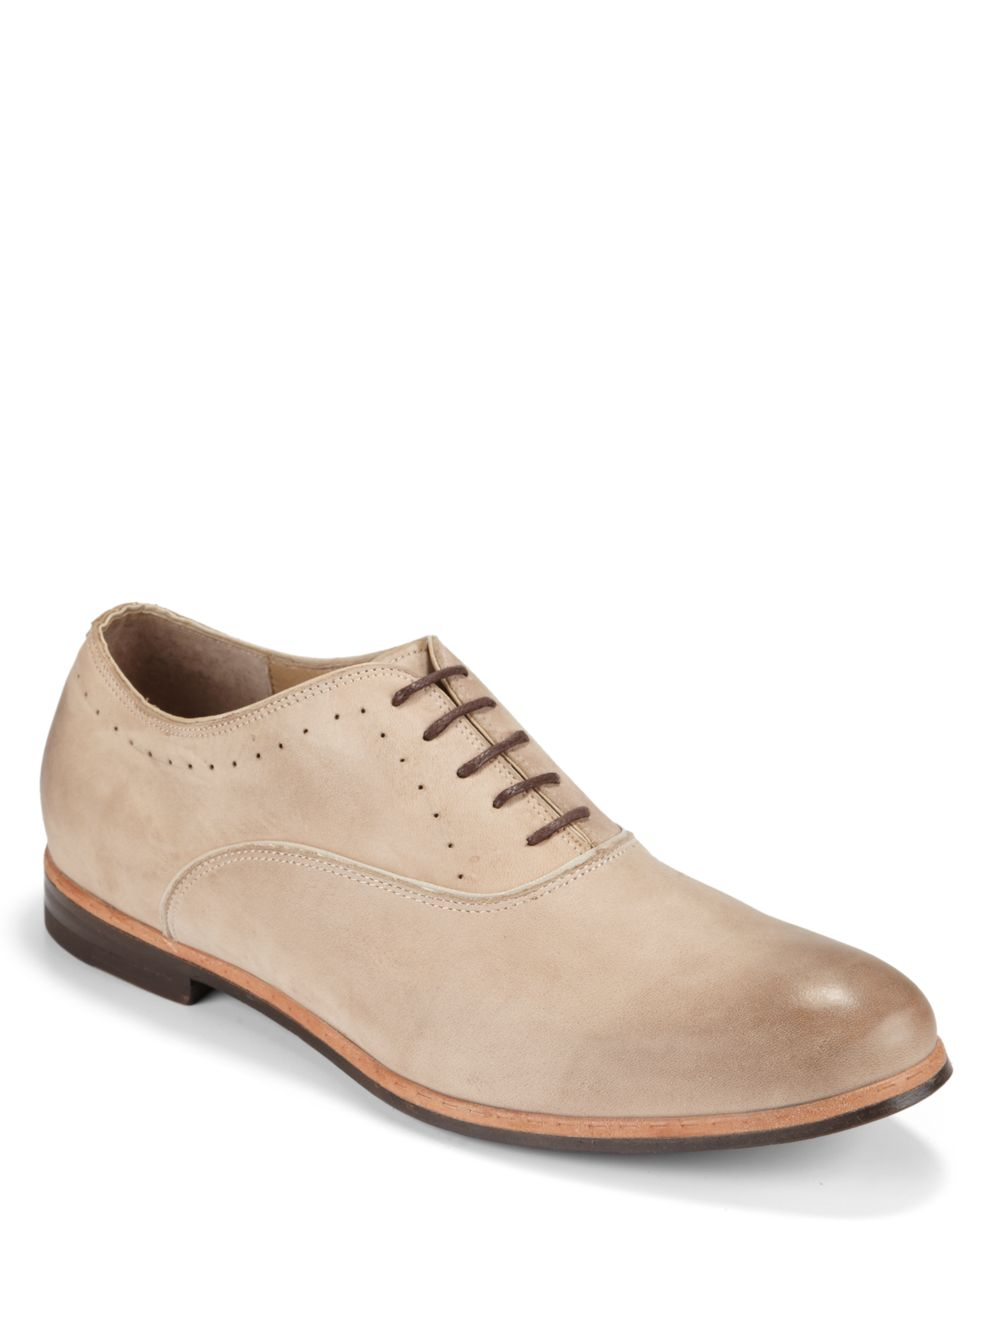 jd fisk burnished leather saddle shoes in